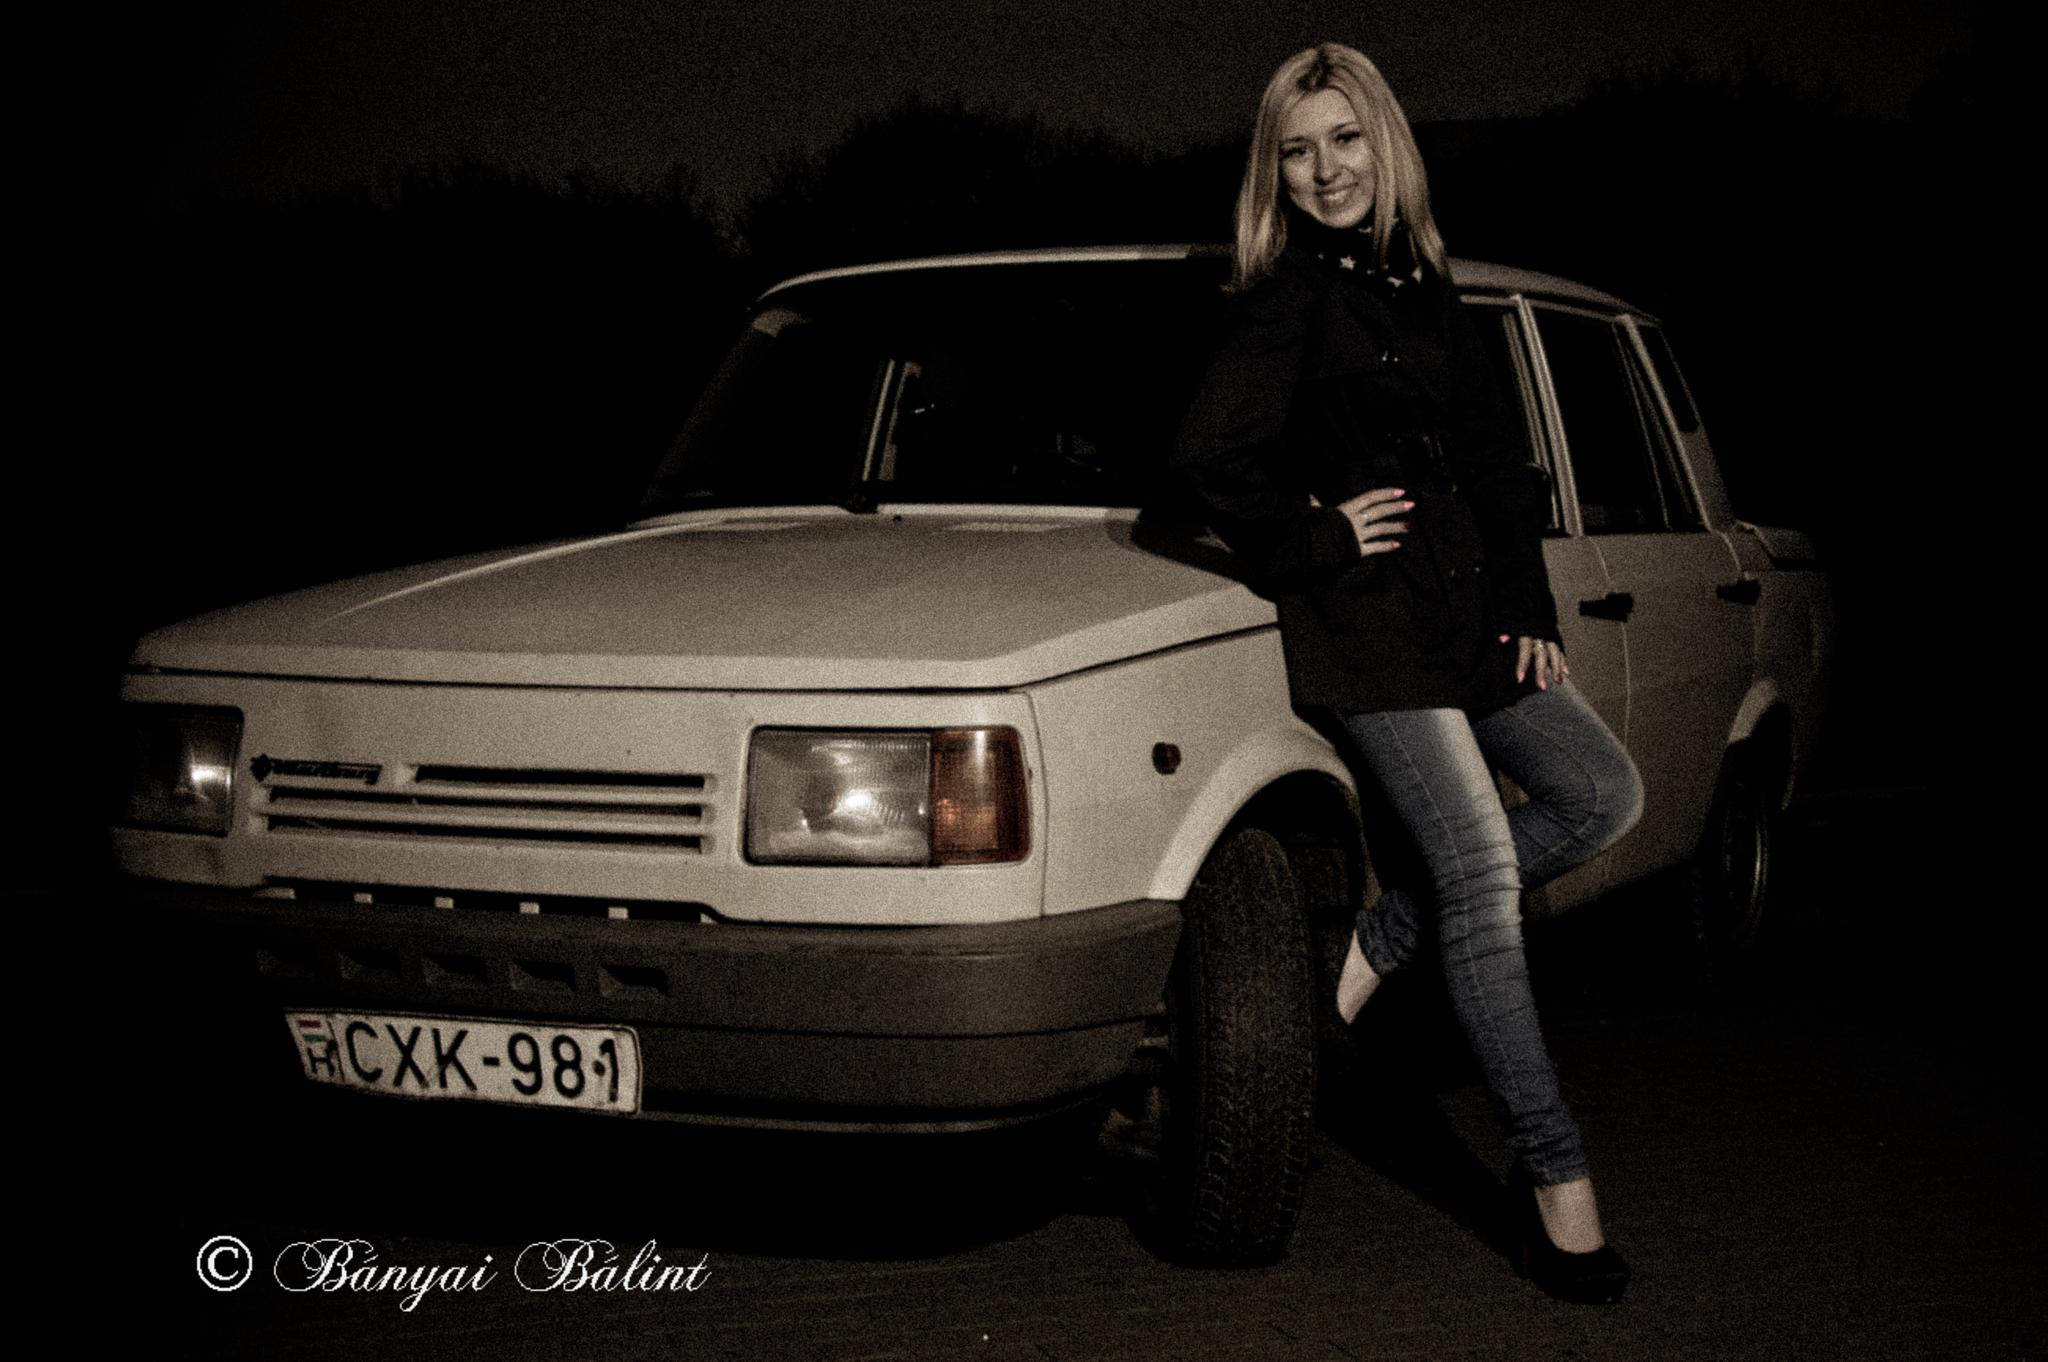 oldtimer beauty shot by banyaibalint